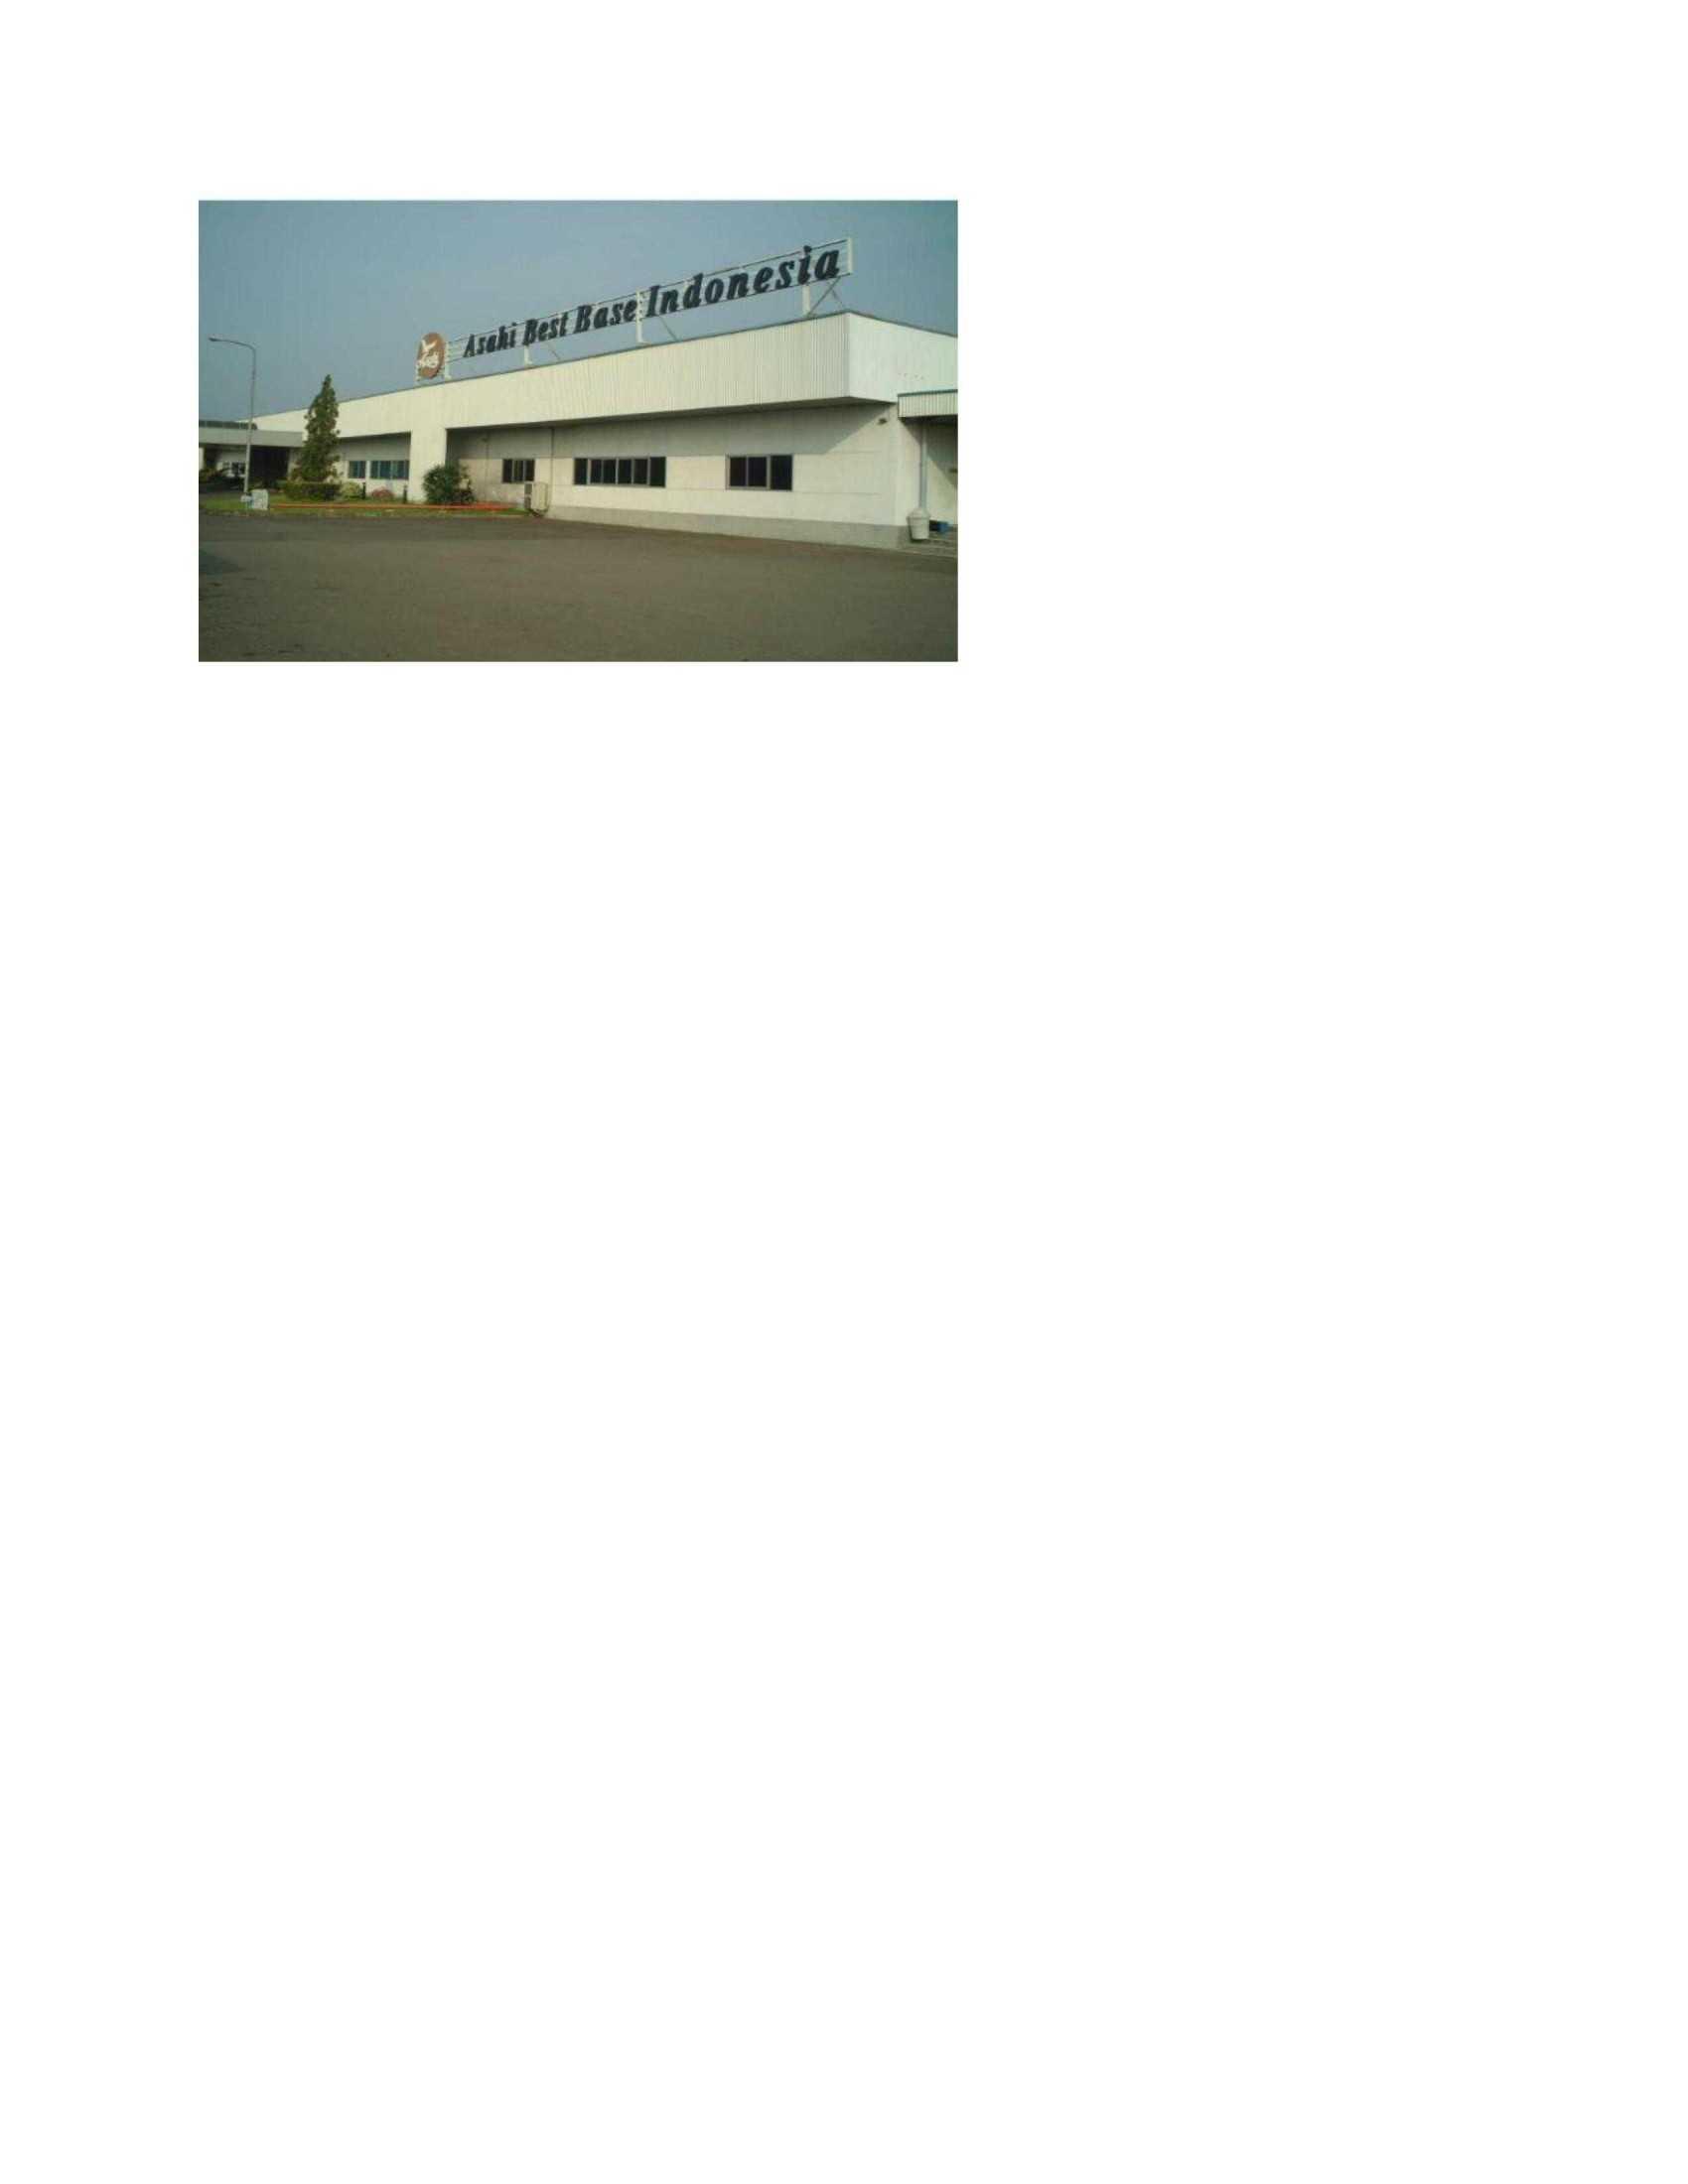 Pt Lismarindo Prima Pt Ashahi Best Base Indonesia Mm2100 Industrial Town Blok C-2, Cikarang Barat, Gandamekar, Gandasari, Kec. Cikarang Bar., Bekasi, Jawa Barat 17520, Indonesia Mm2100 Industrial Town Blok C-2, Cikarang Barat, Gandamekar, Gandasari, Kec. Cikarang Bar., Bekasi, Jawa Barat 17520, Indonesia Pt-Lismarindo-Prima-Pt-Ashahi-Best-Base-Indonesia  120429